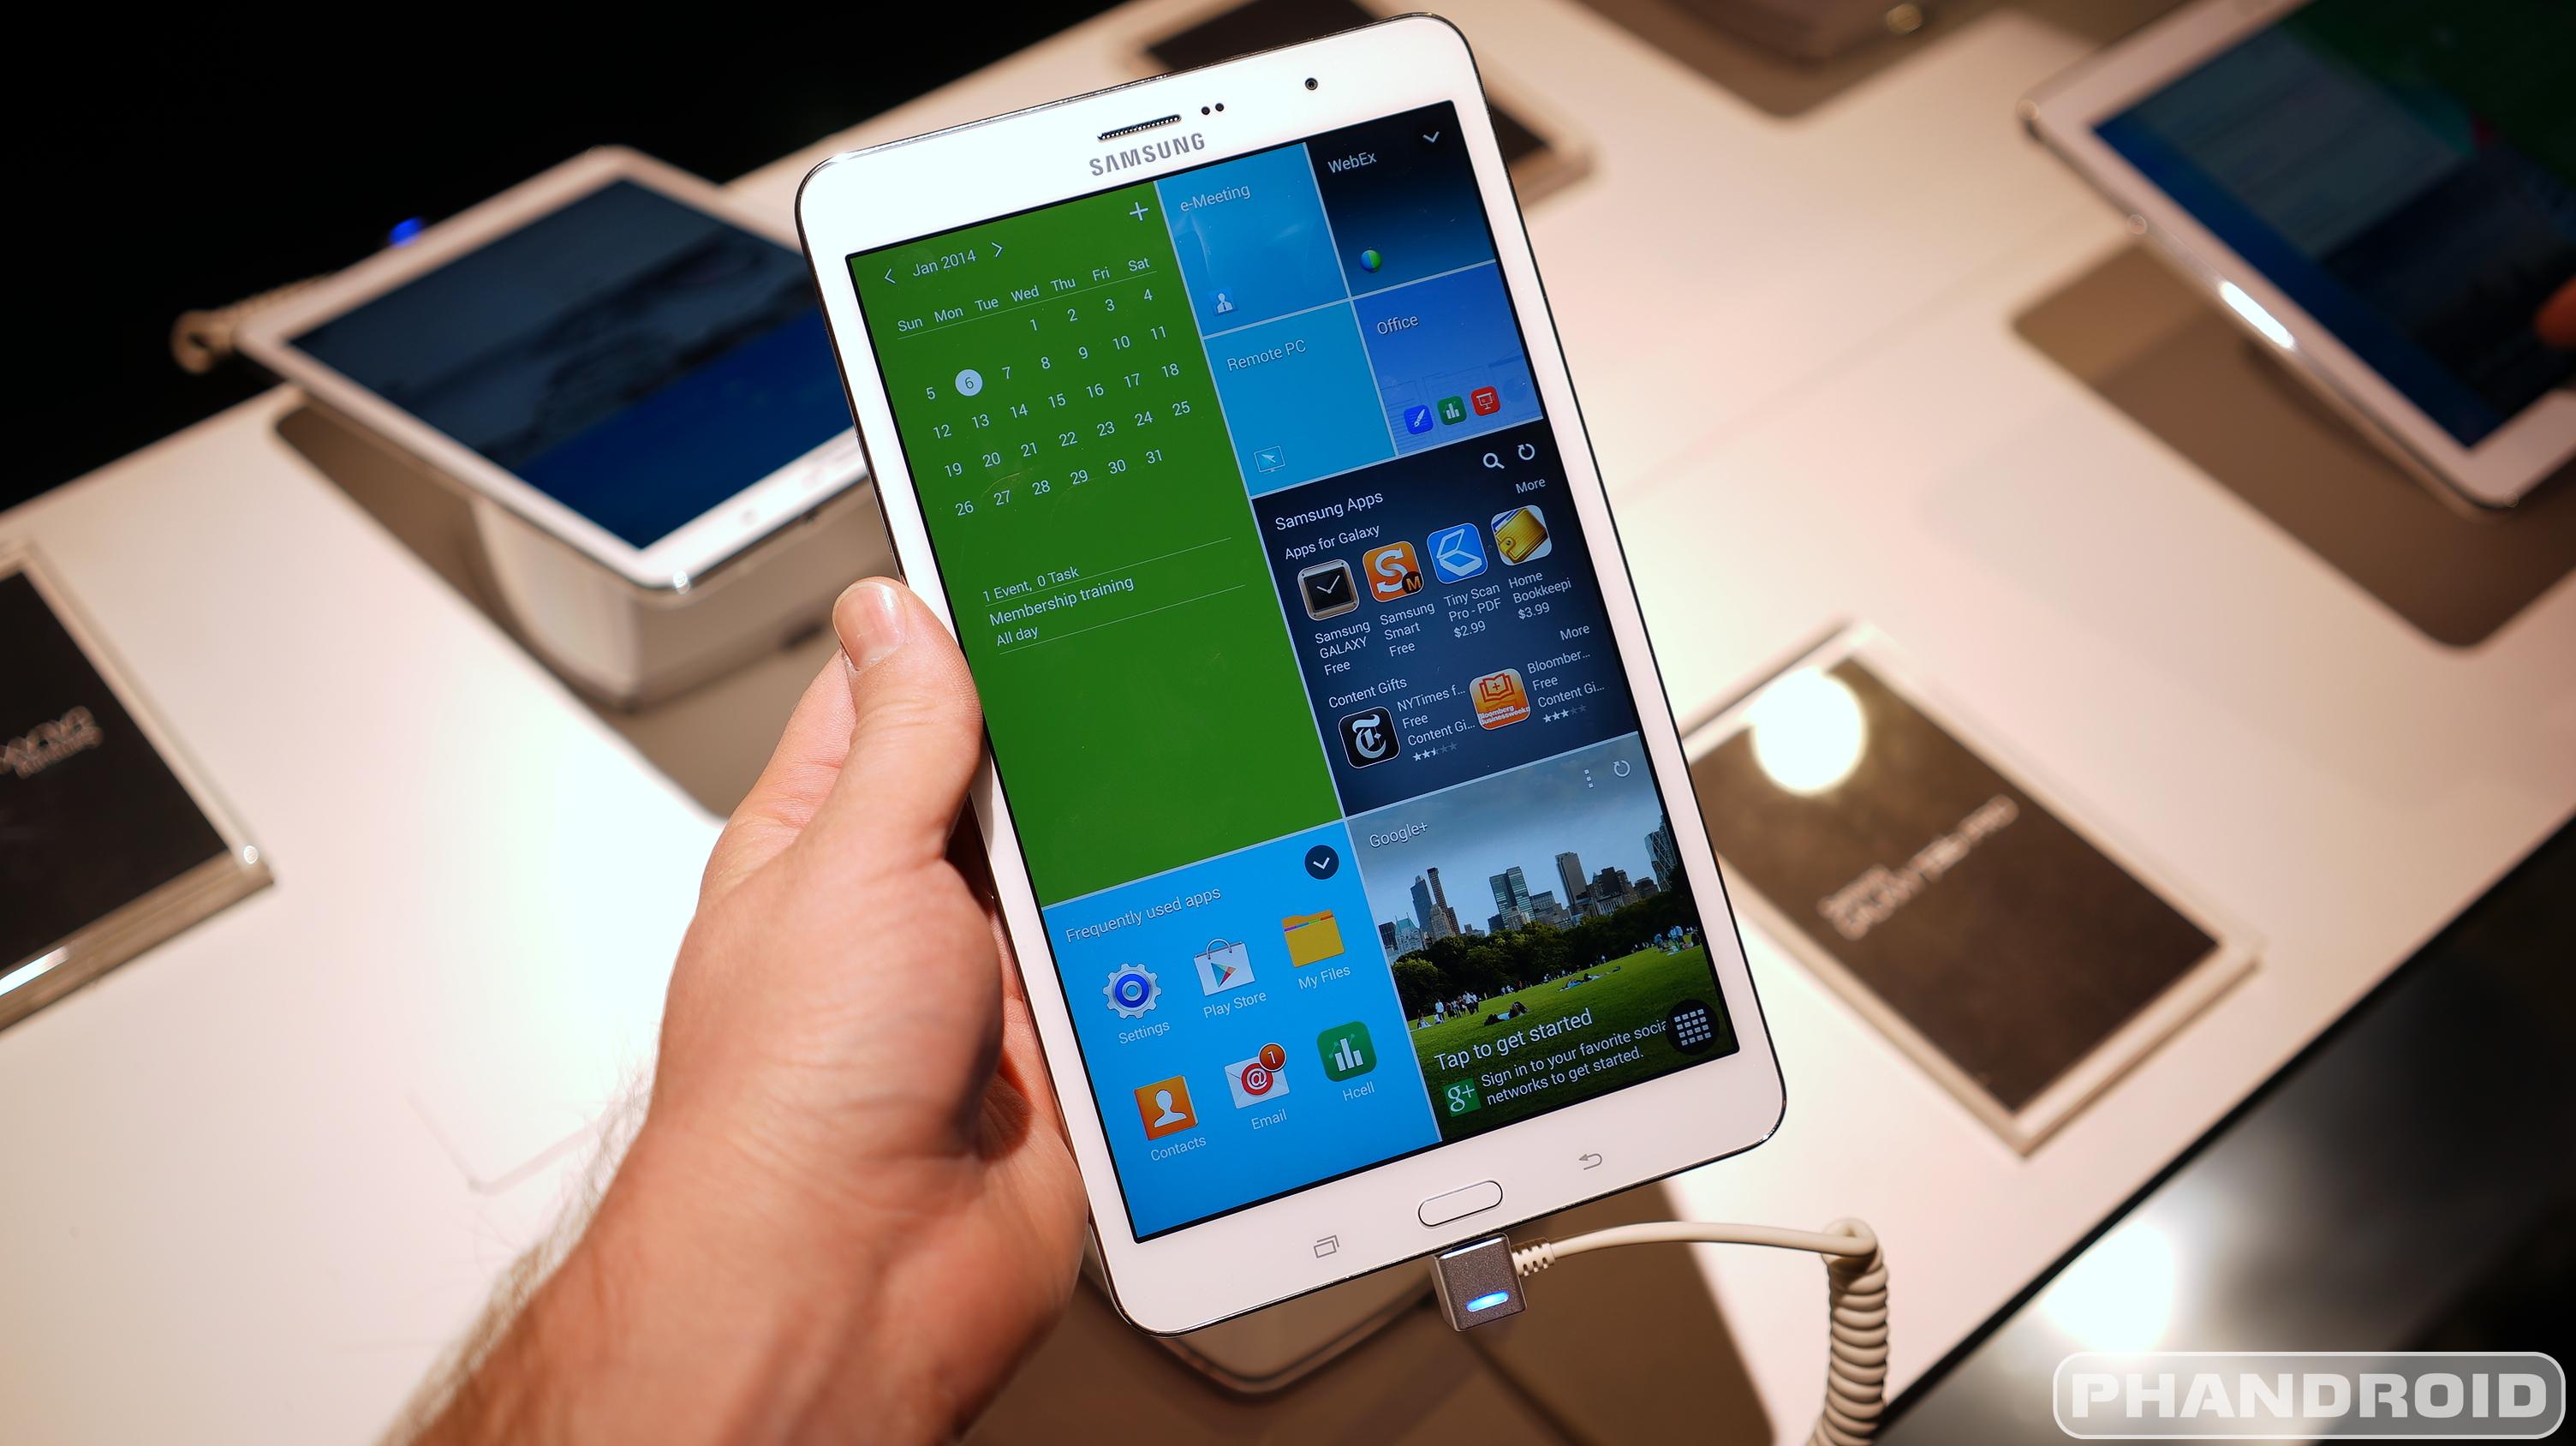 Samsung Galaxy Tab Pro 8.4 DSC05087 Offerta: Samsung Galaxy Tab Pro 8.4 LTE in offerta a 249€ solo per domani